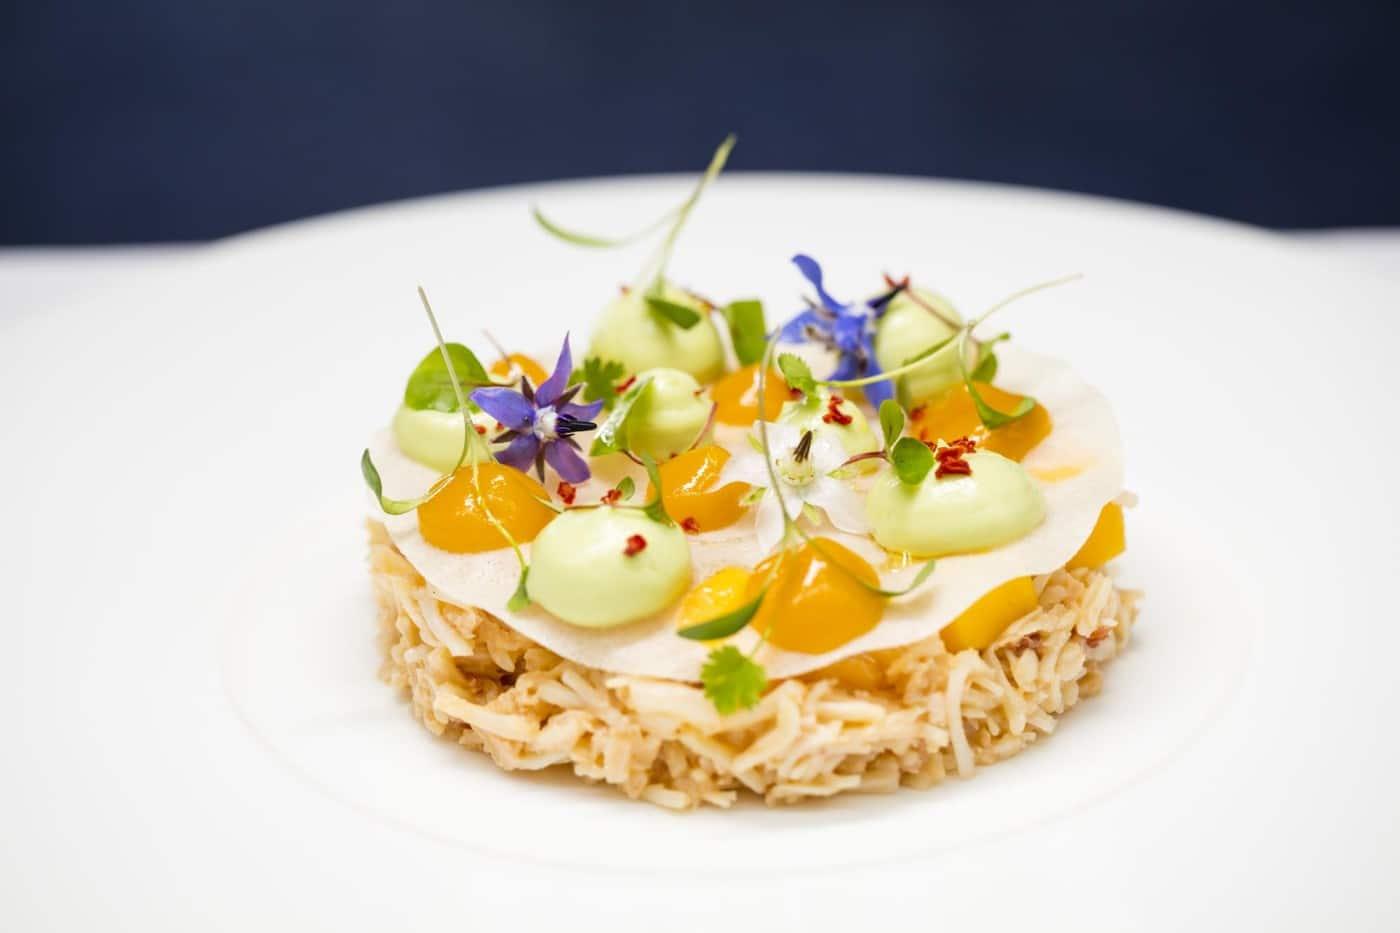 dorset-crab-mango-avocado